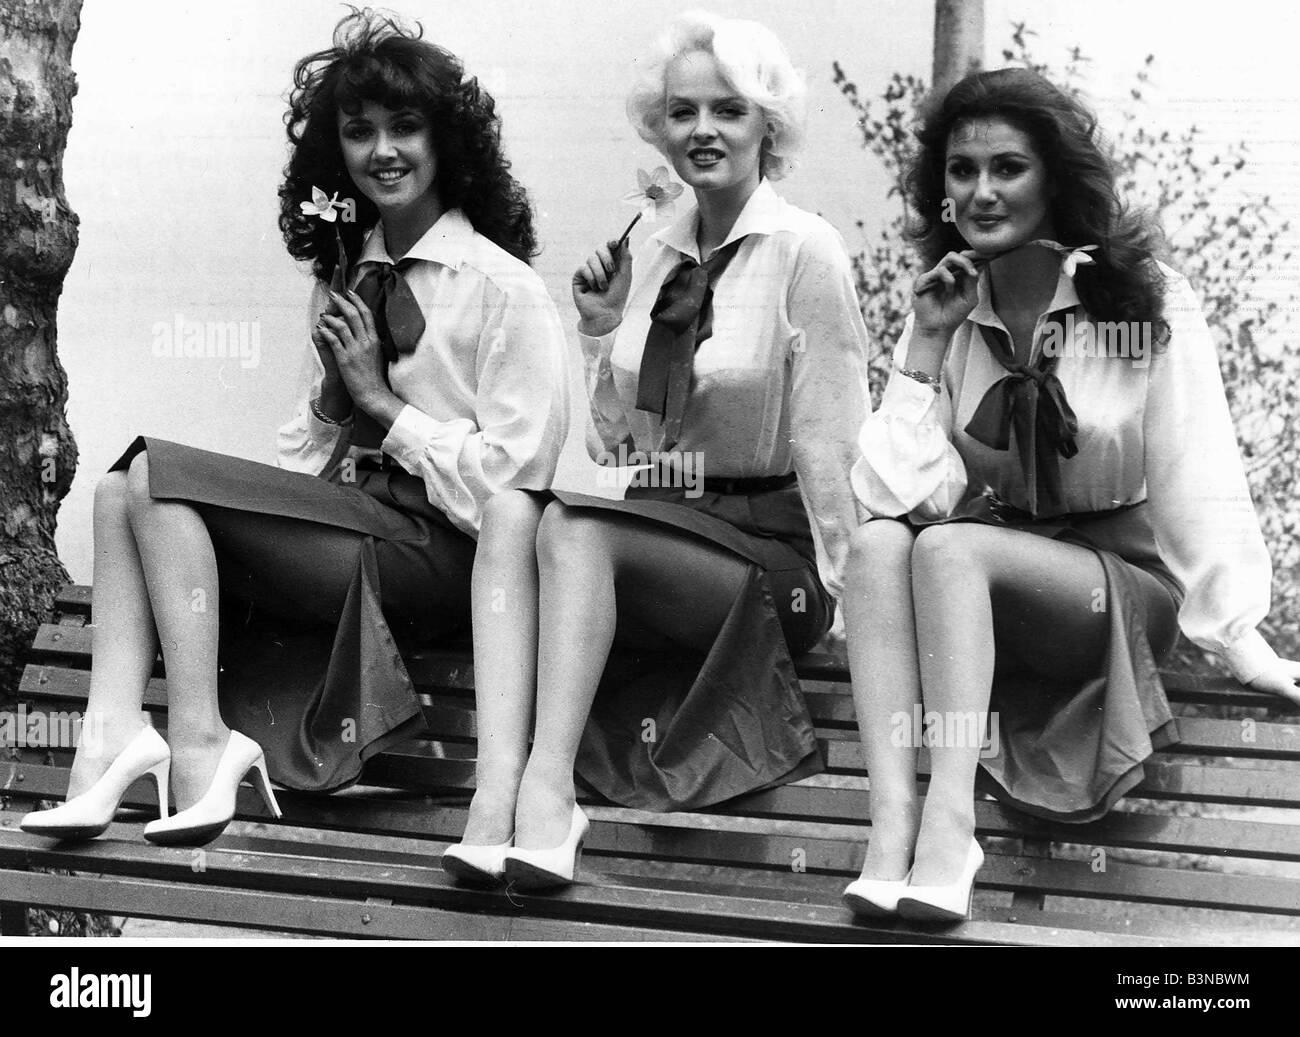 Nene Tamayo (b. 1981) Adult pics & movies Amy Van Dyken 6 Olympic medals,Amanda Seyfried